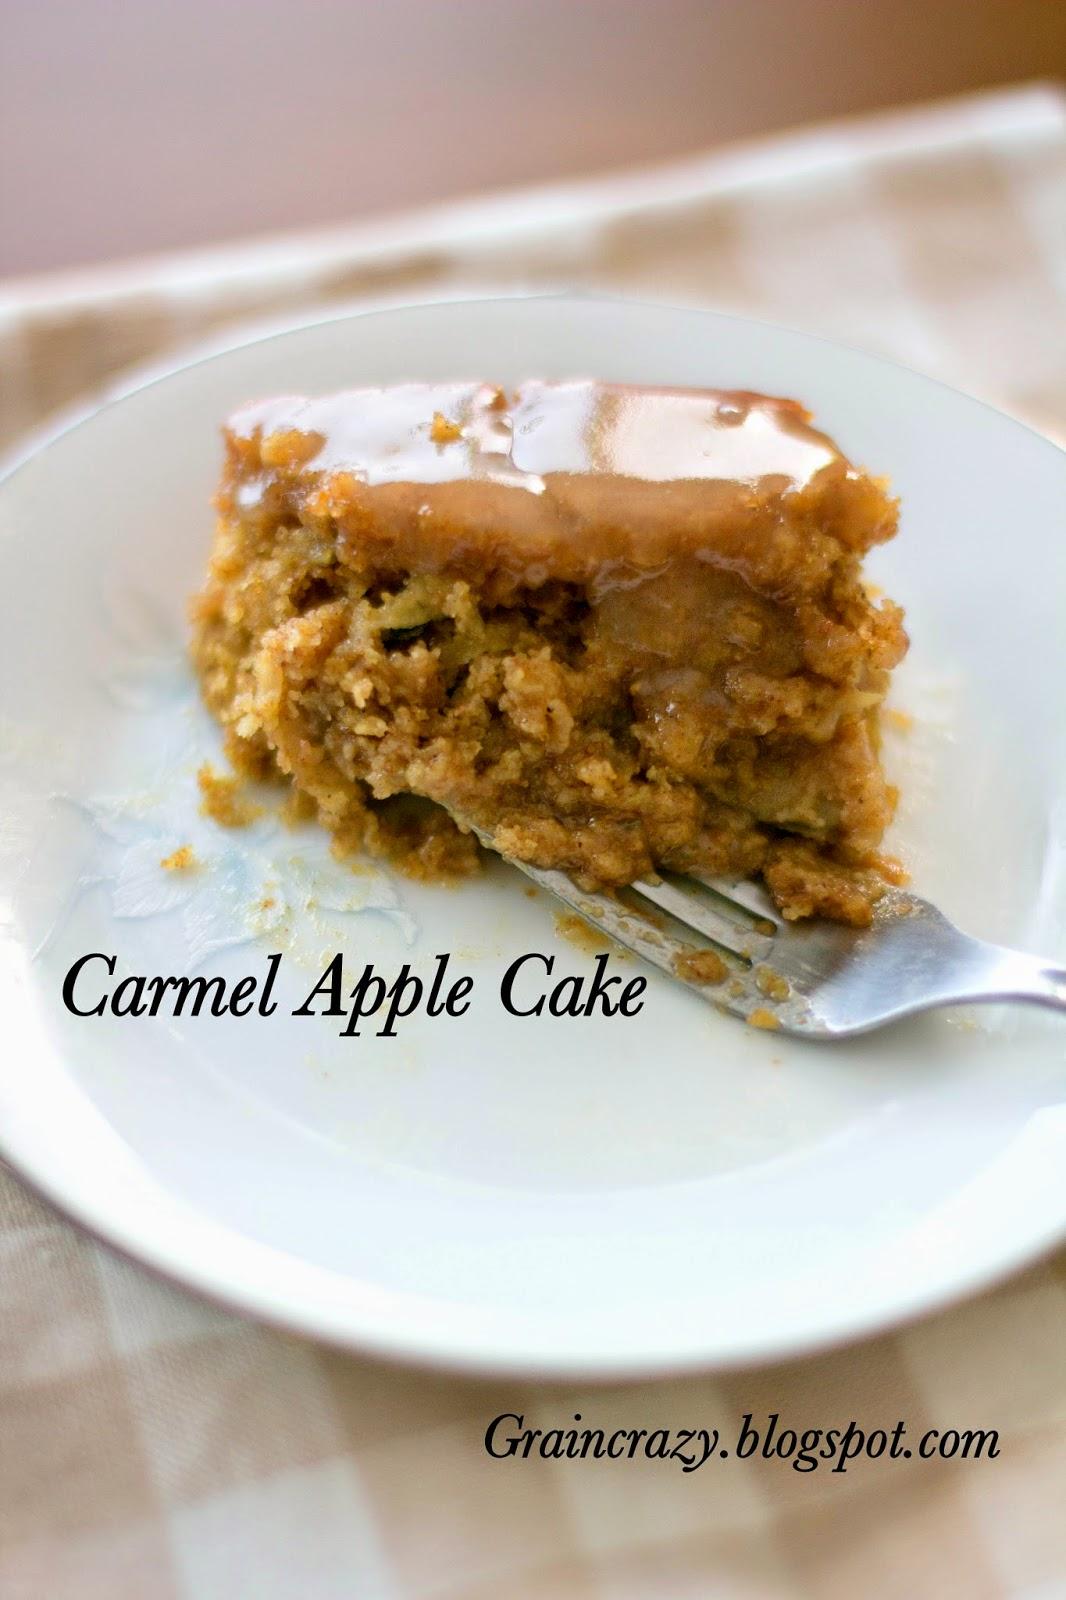 Grain Crazy: Caramel Apple Cake (Whole Grain)